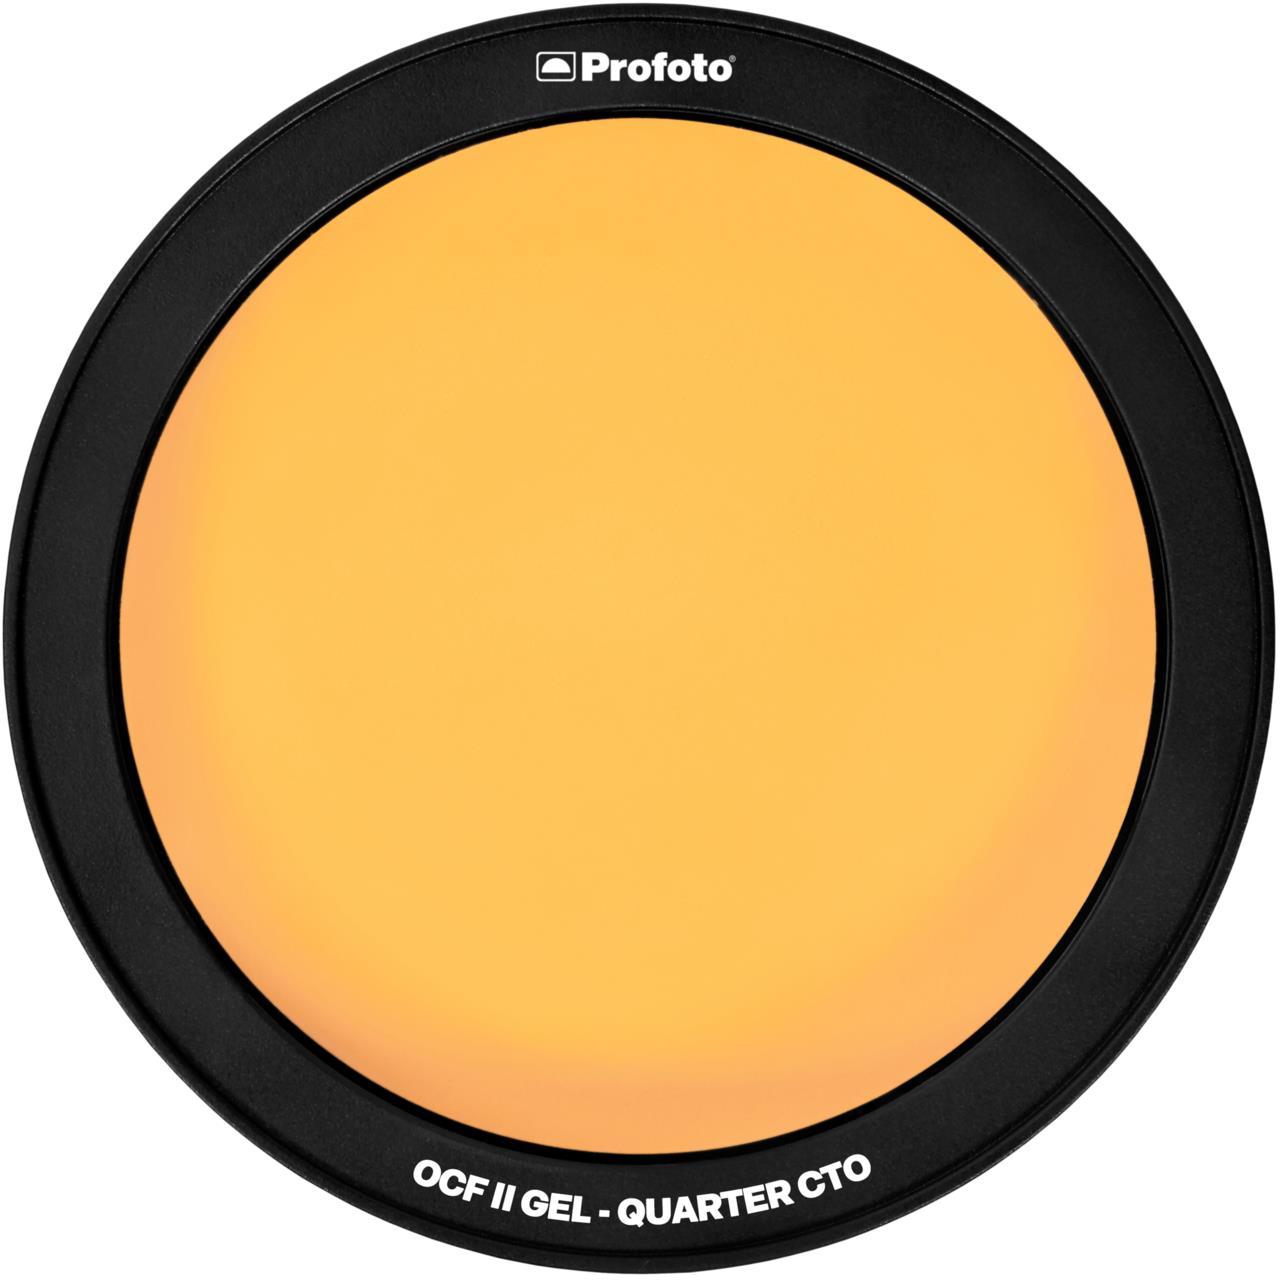 Profoto OCF II Gel - Quarter CTO